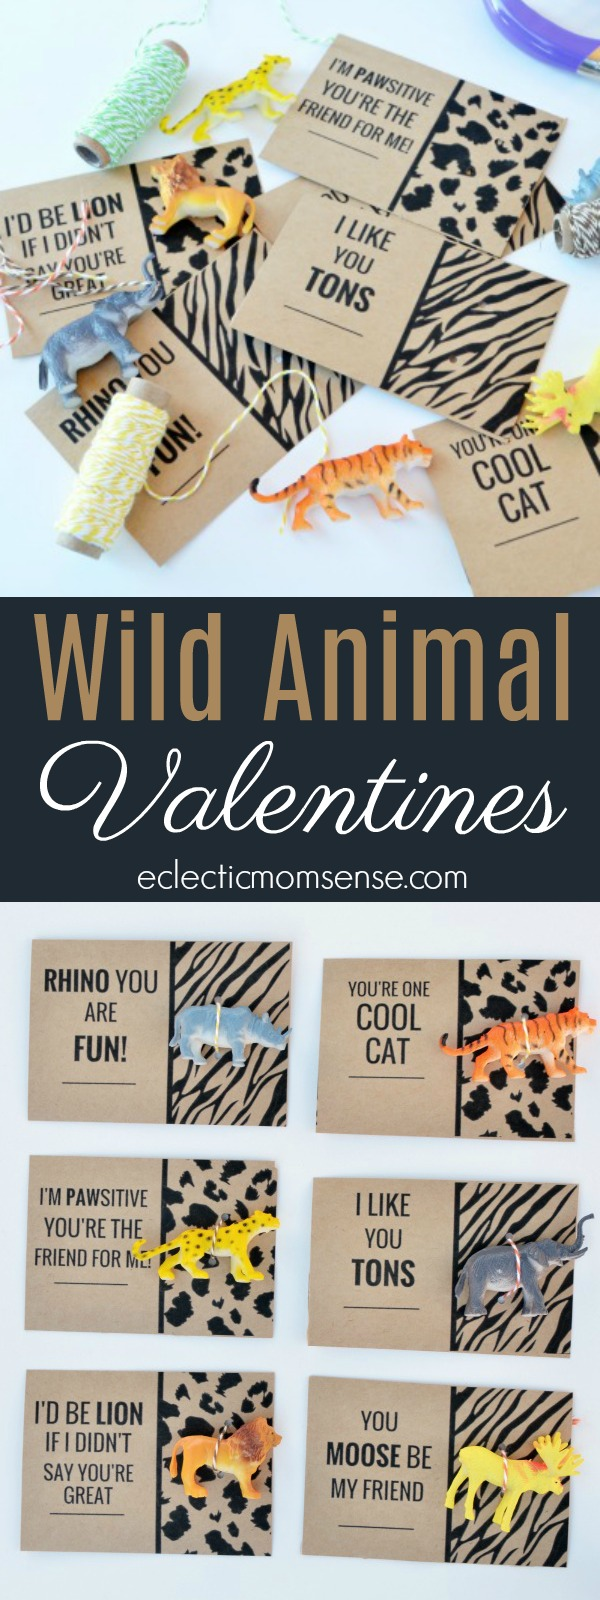 wild animal valentines